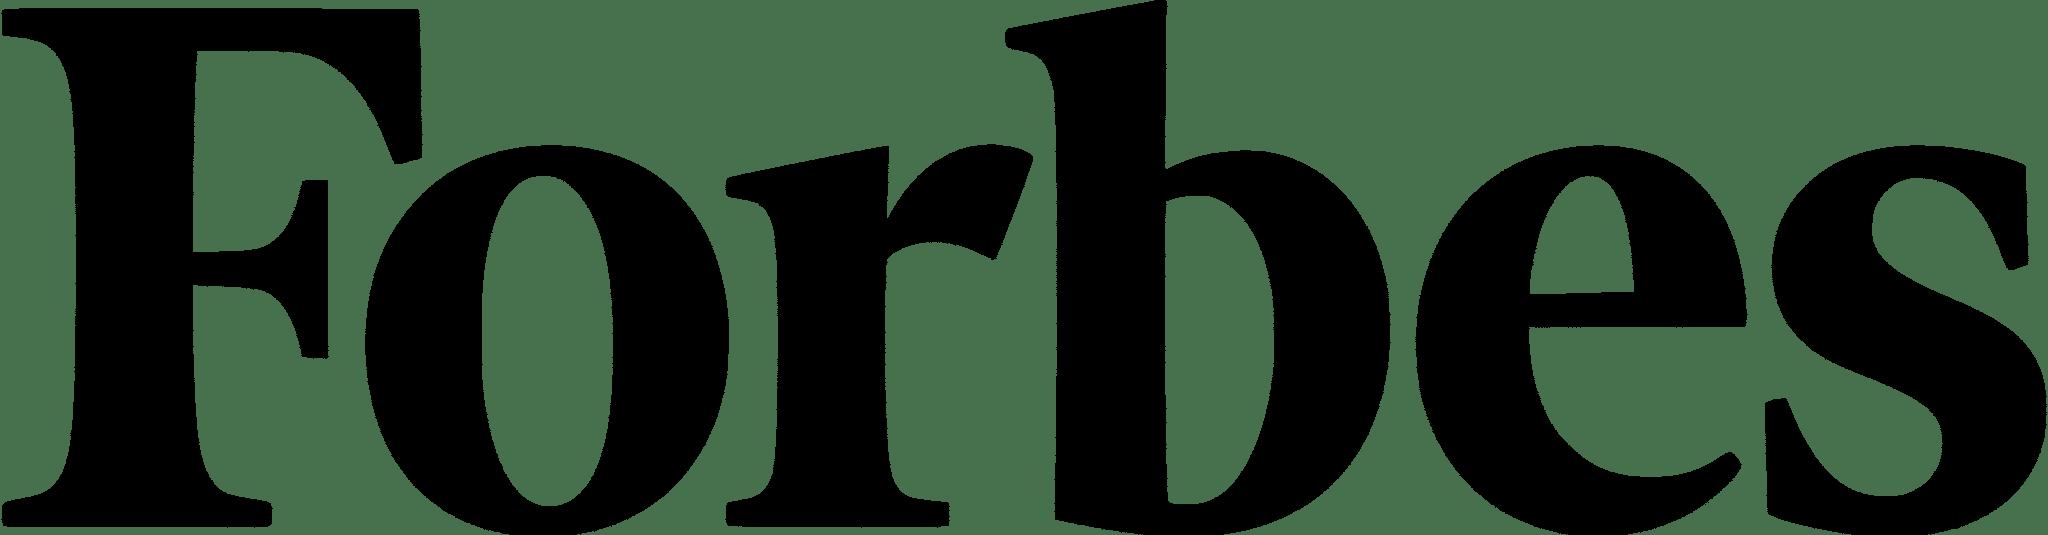 Forbes presse